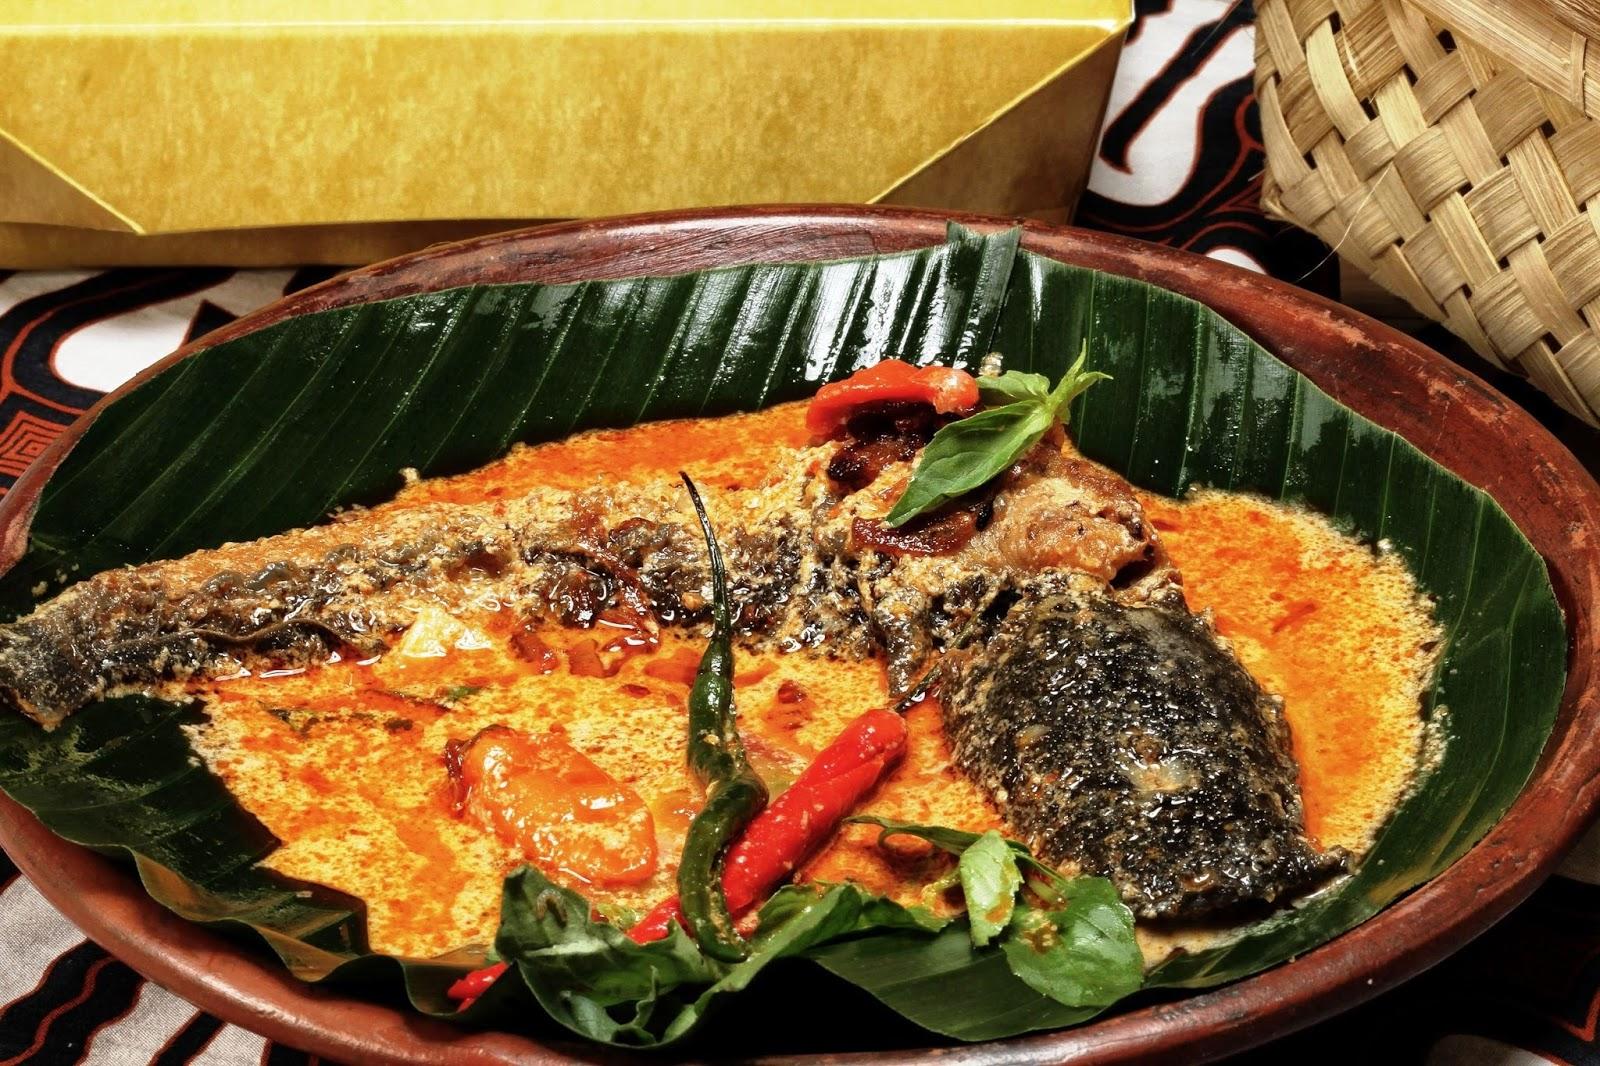 resep masakan ikan lele